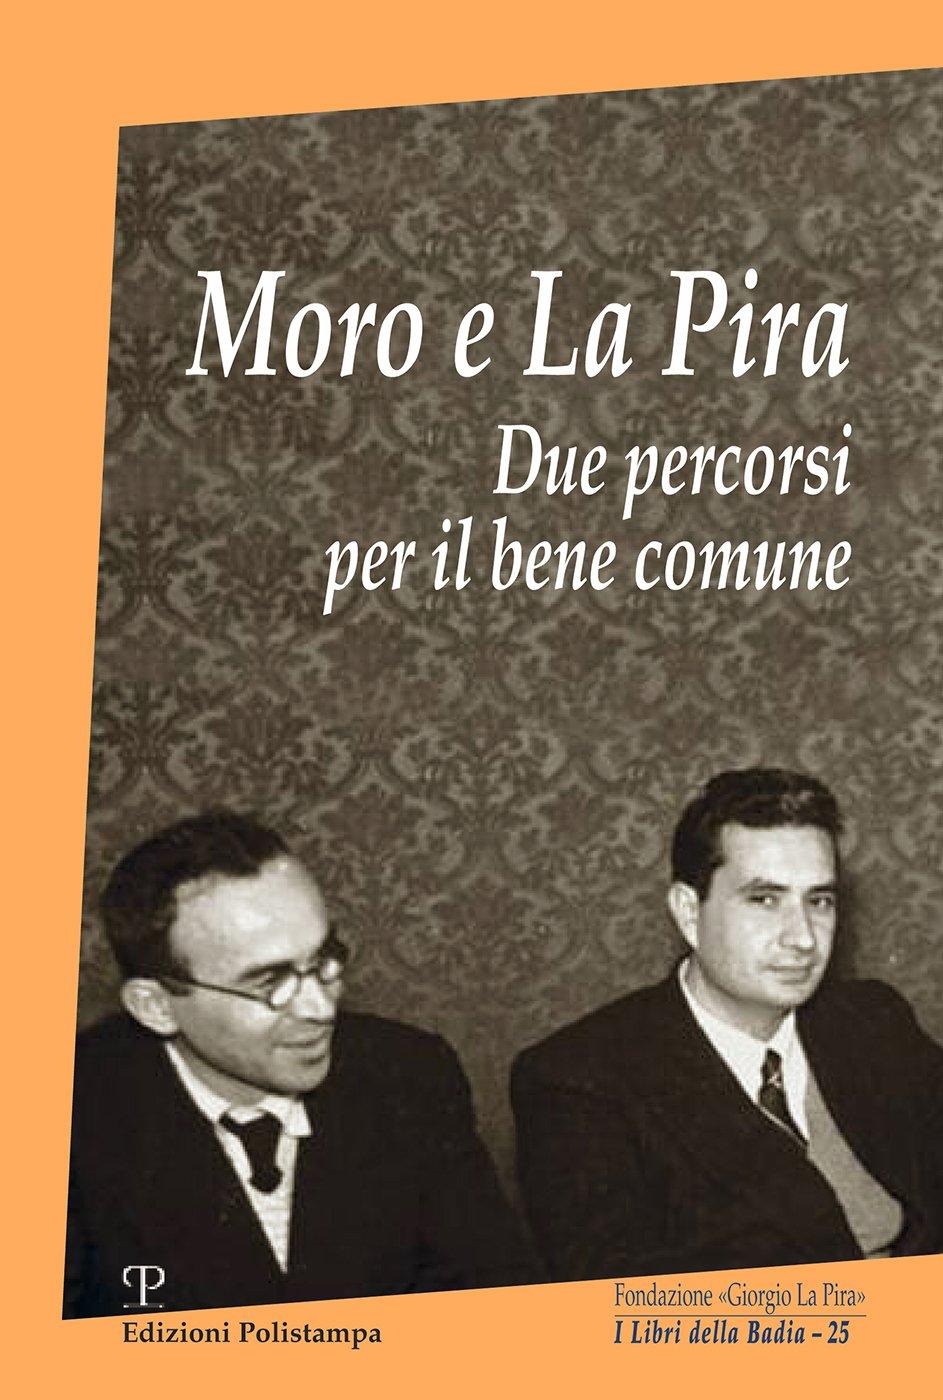 Moro e La Pira